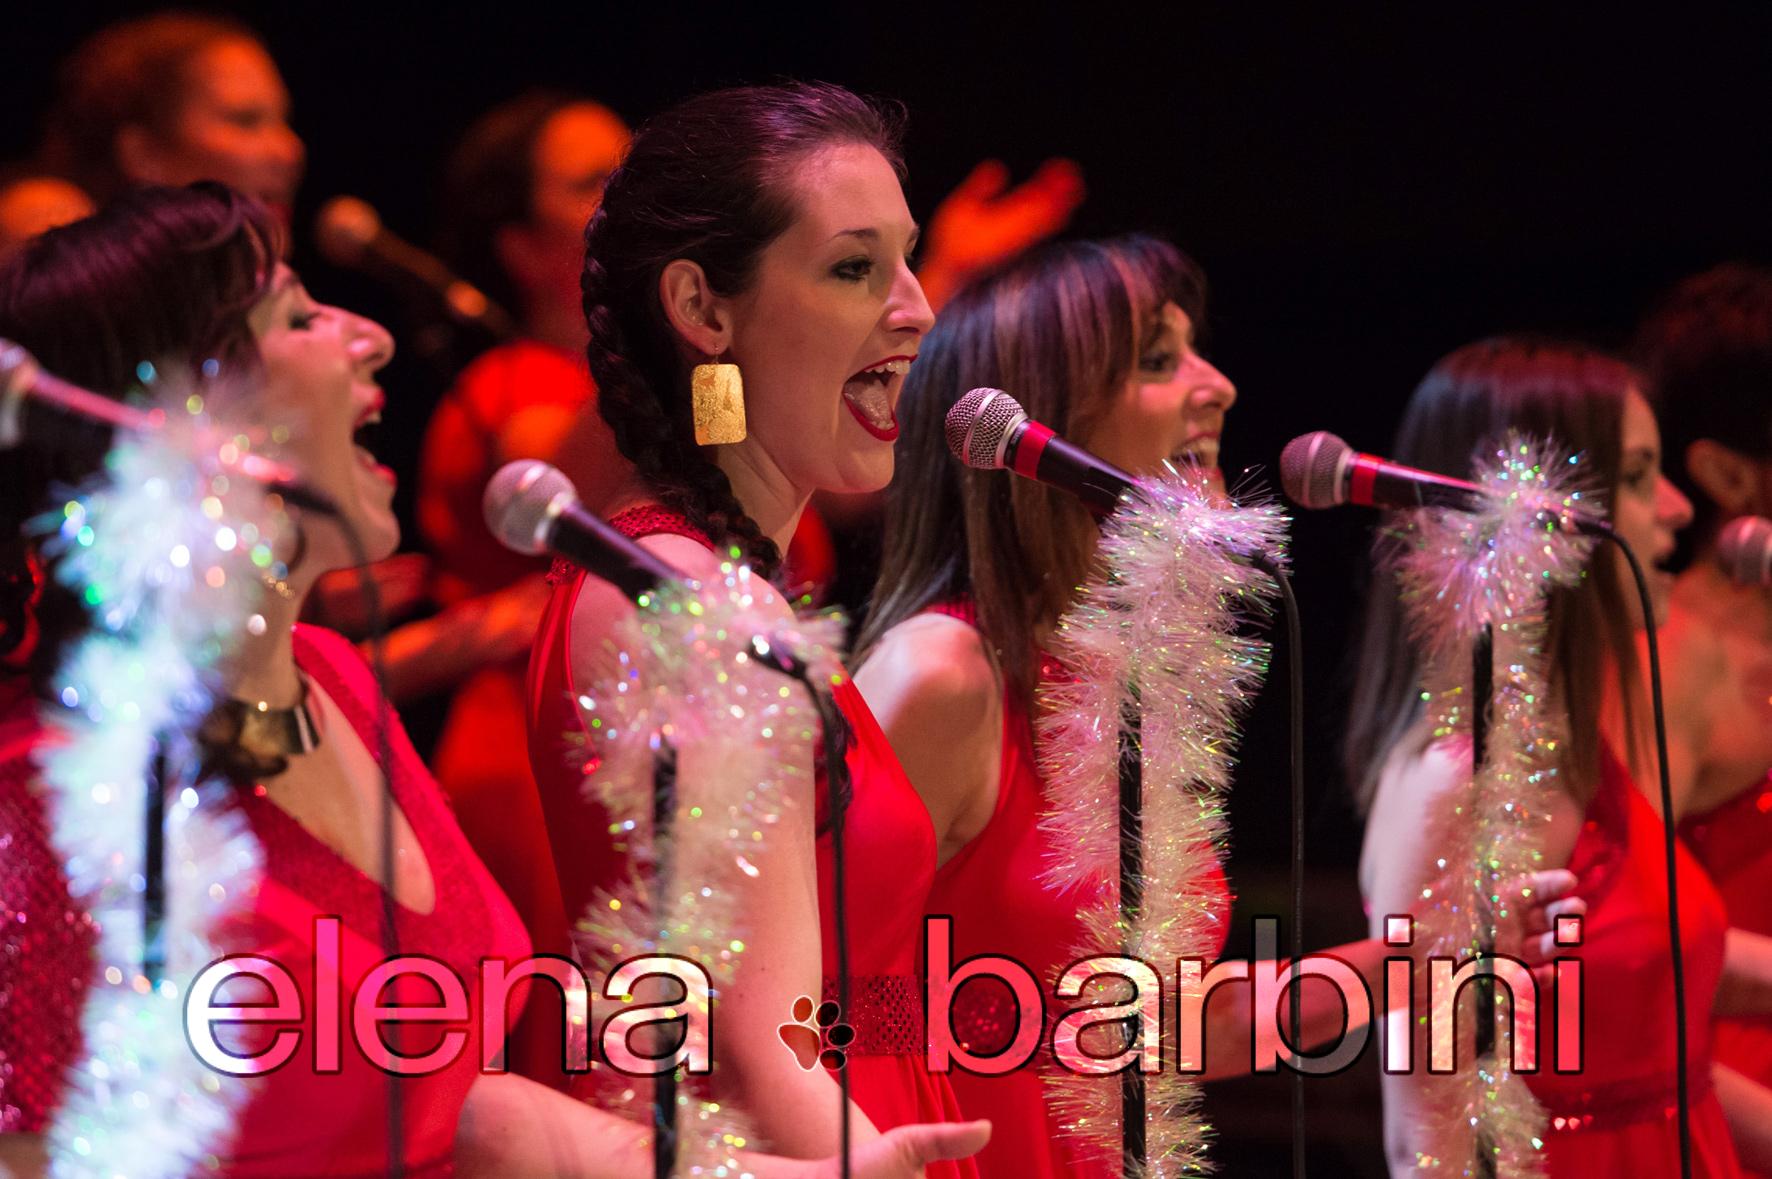 Elena Barbini fotografa concerto BluBordò al Teatro Verdi di Padova